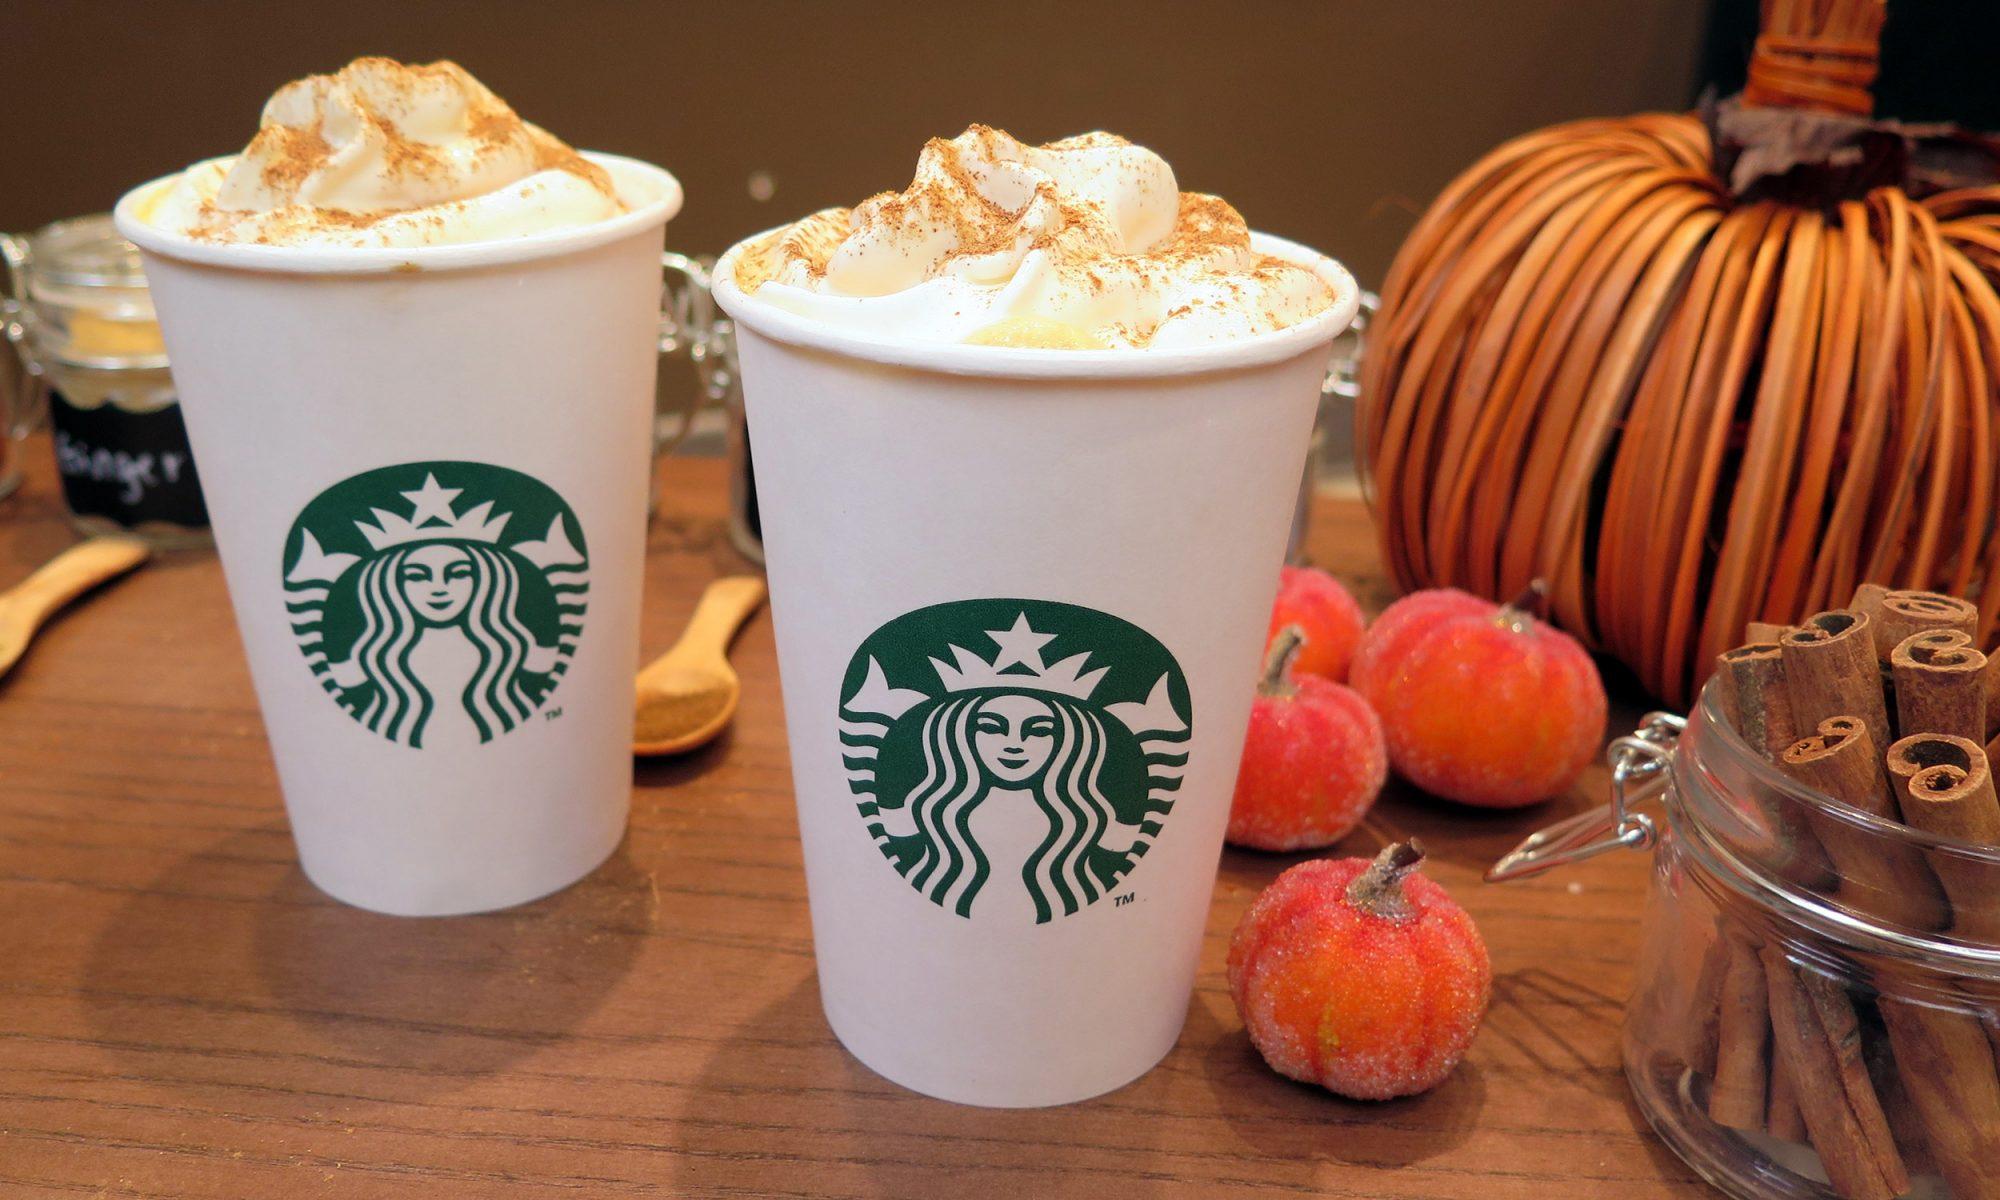 EC: The Starbucks Pumpkin Spice Latte Chat Bot Is Nightmare Fuel